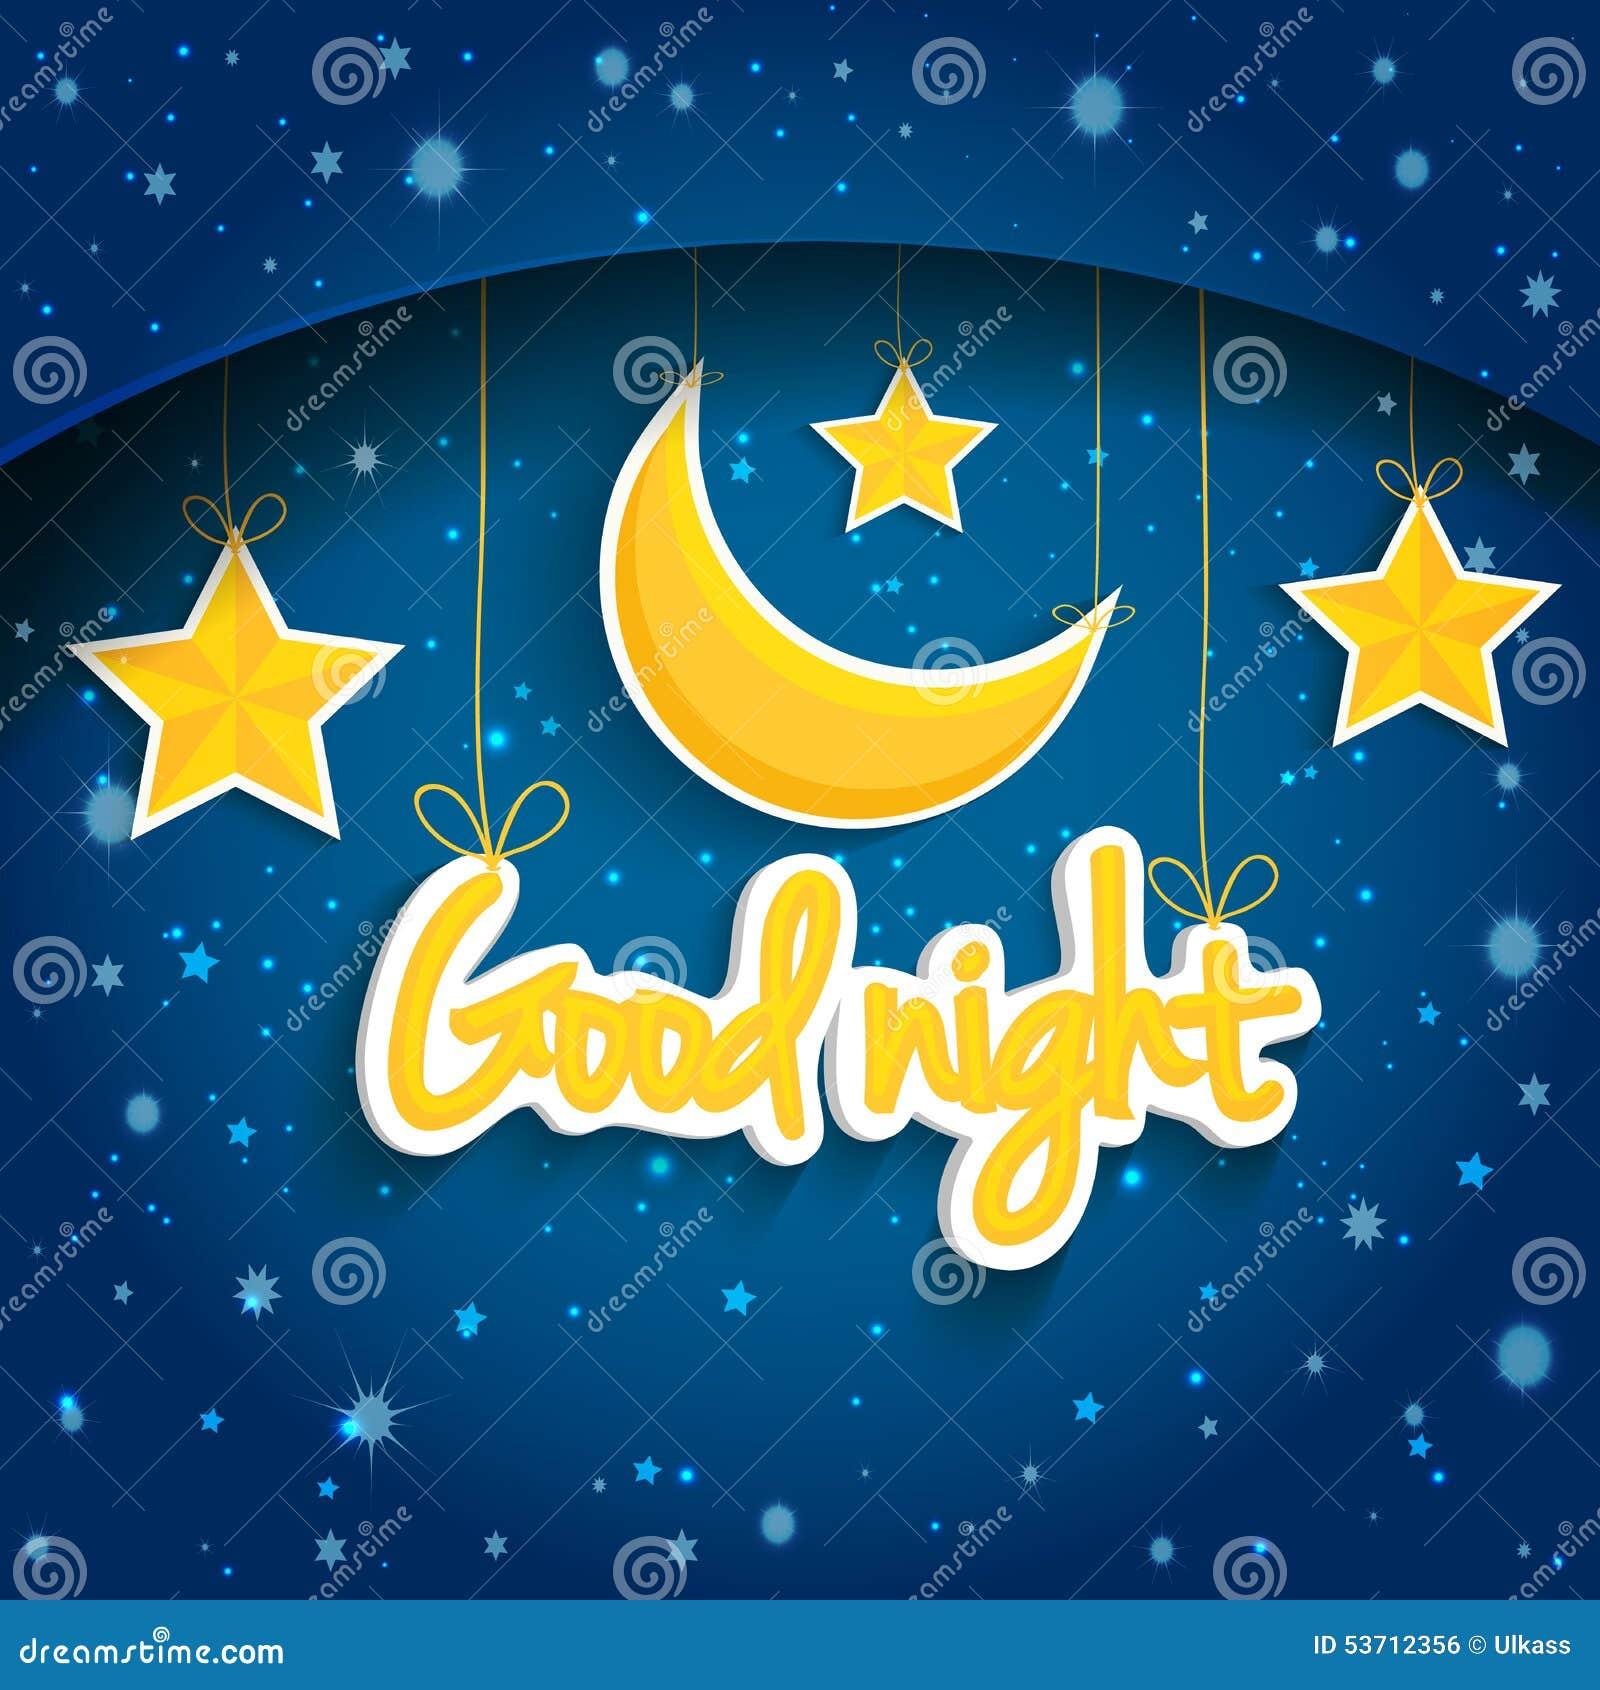 cartoon night vector wallpaper - photo #25